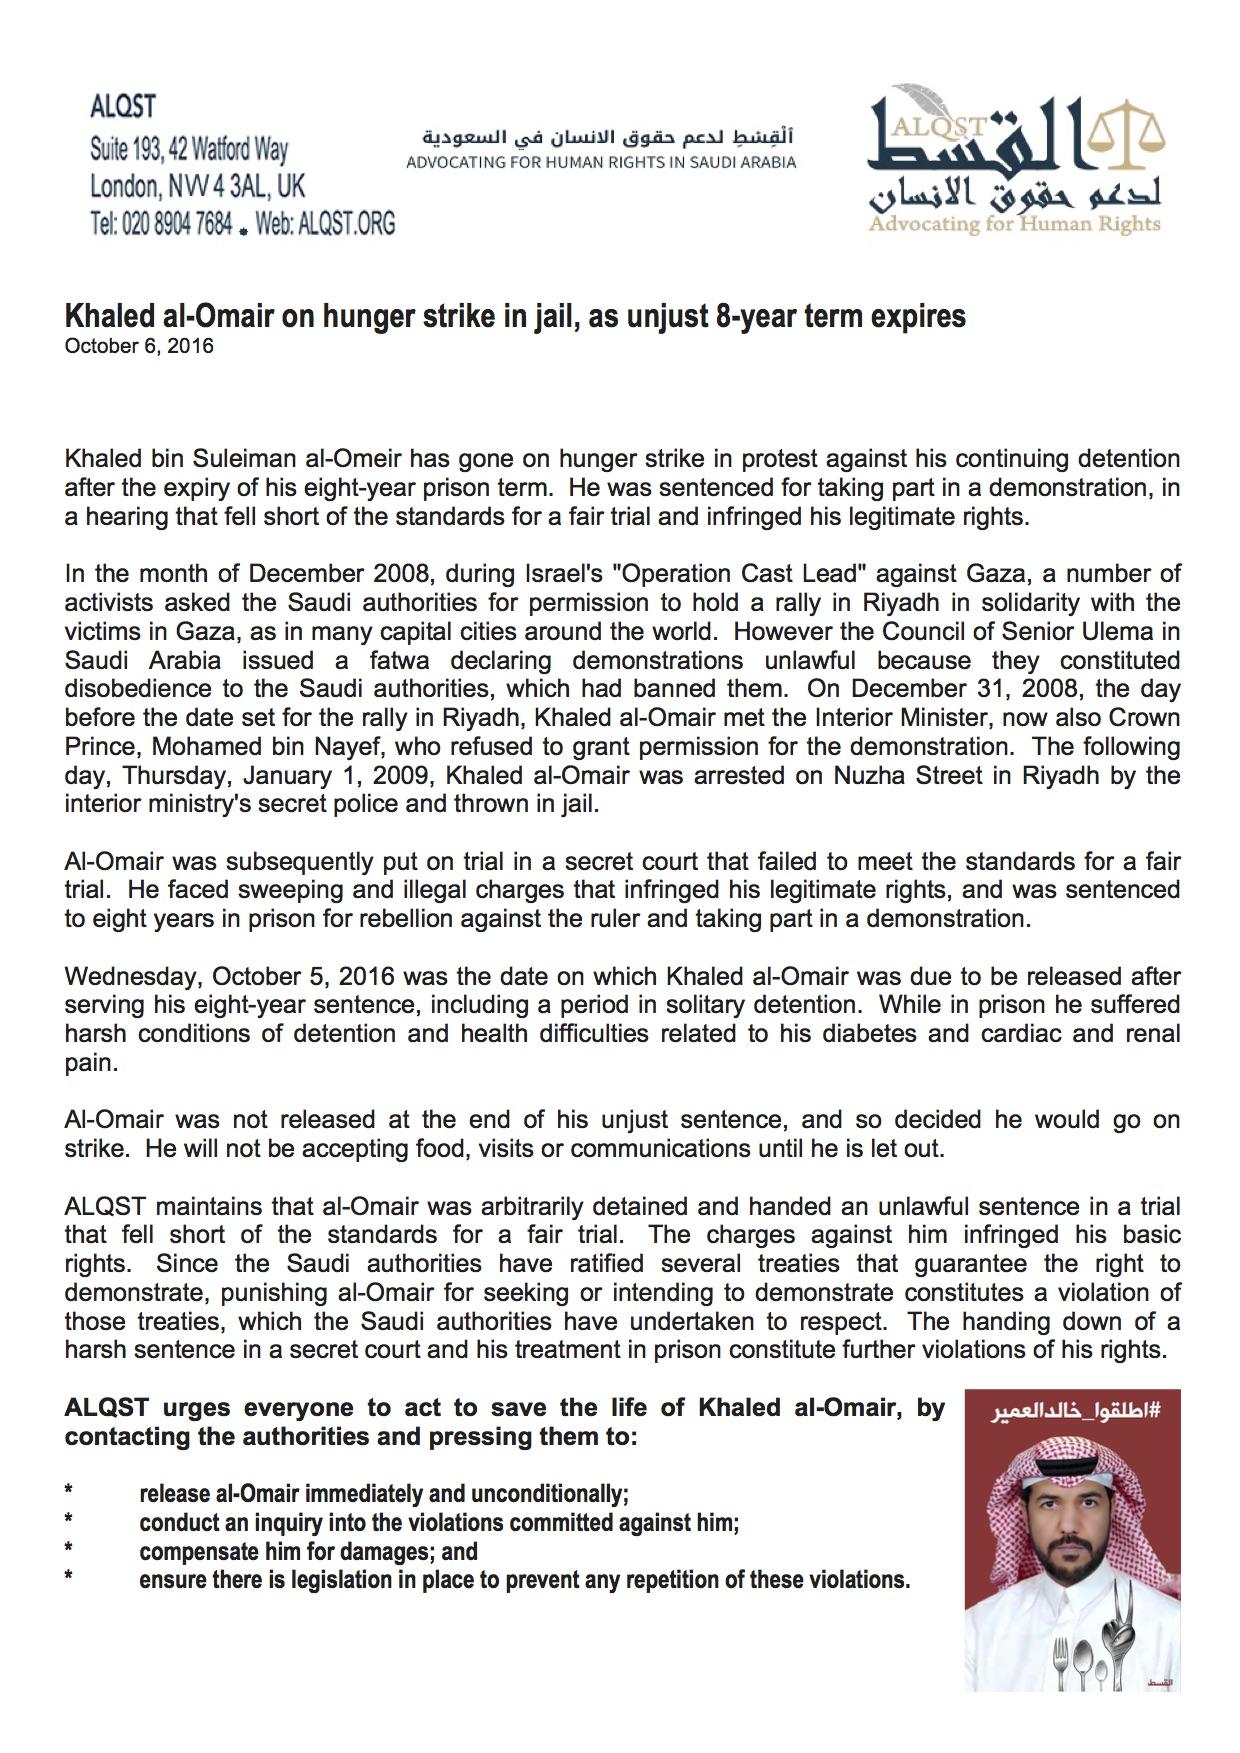 khaled-al-omair-on-hunger-strike-in-jail-as-unjust-8-year-term-expires